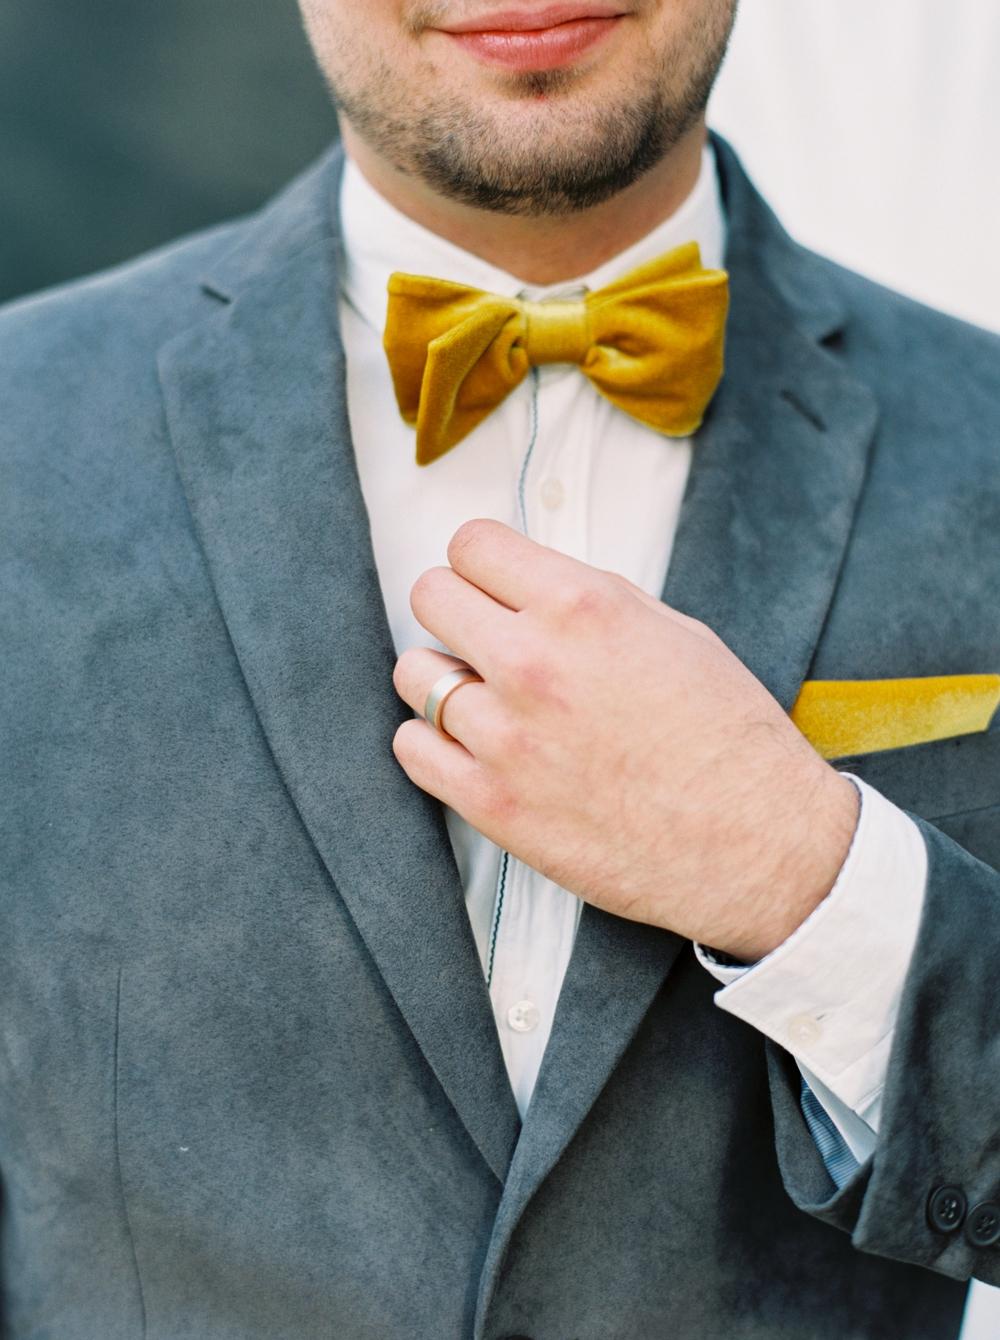 groom-straightening-yellow-bow-tie